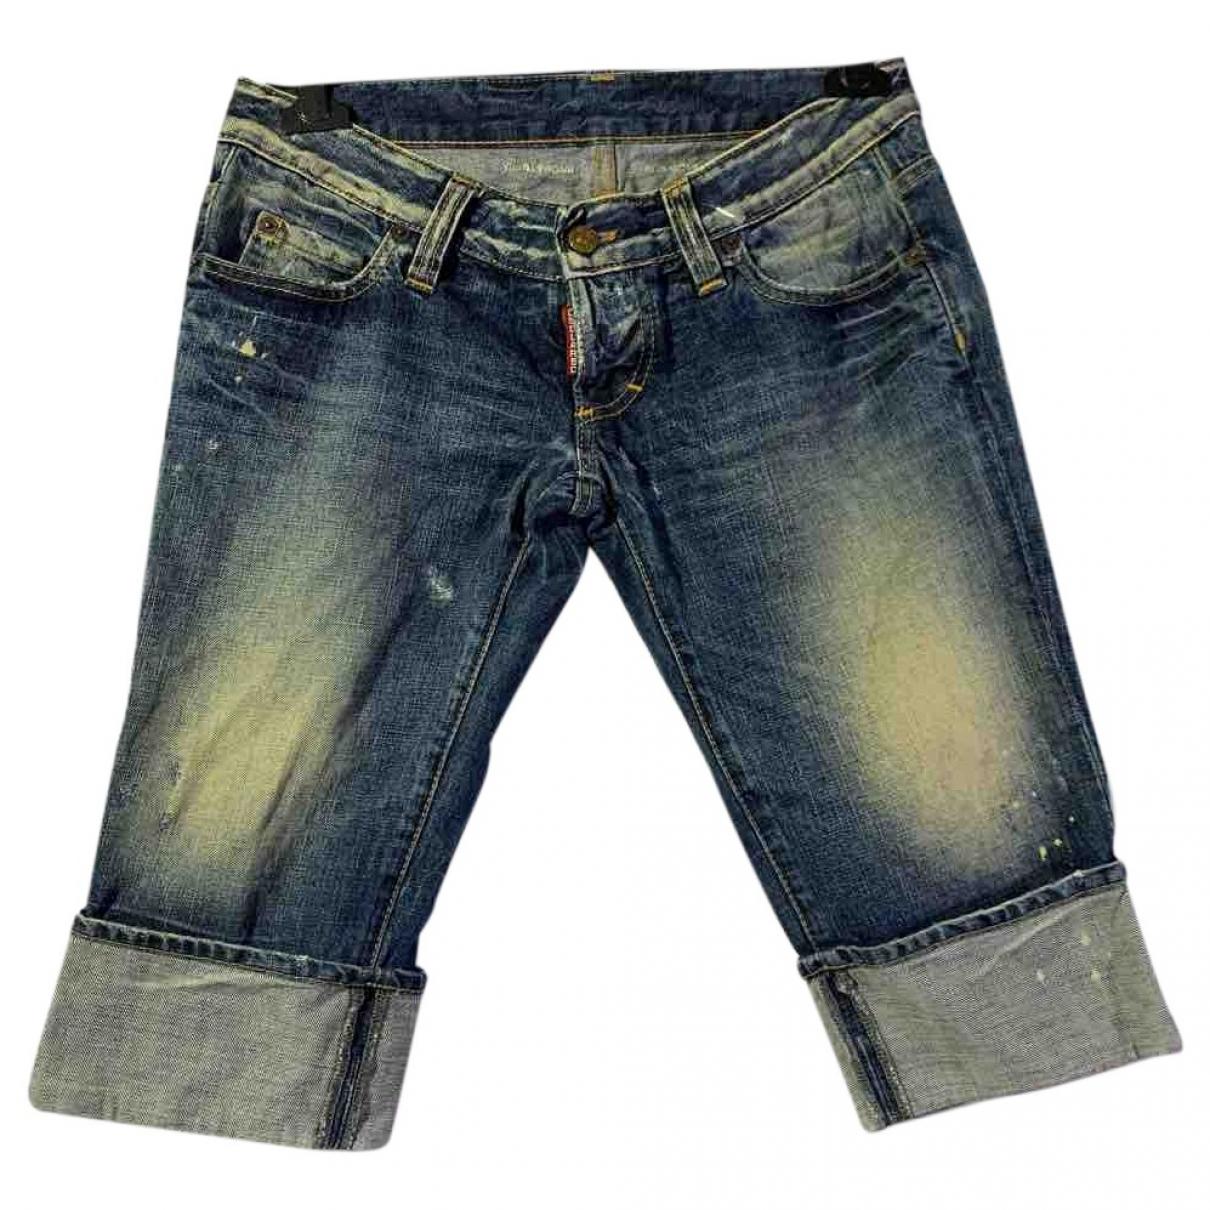 Dsquared2 \N Blue Denim - Jeans Shorts for Men 44 IT